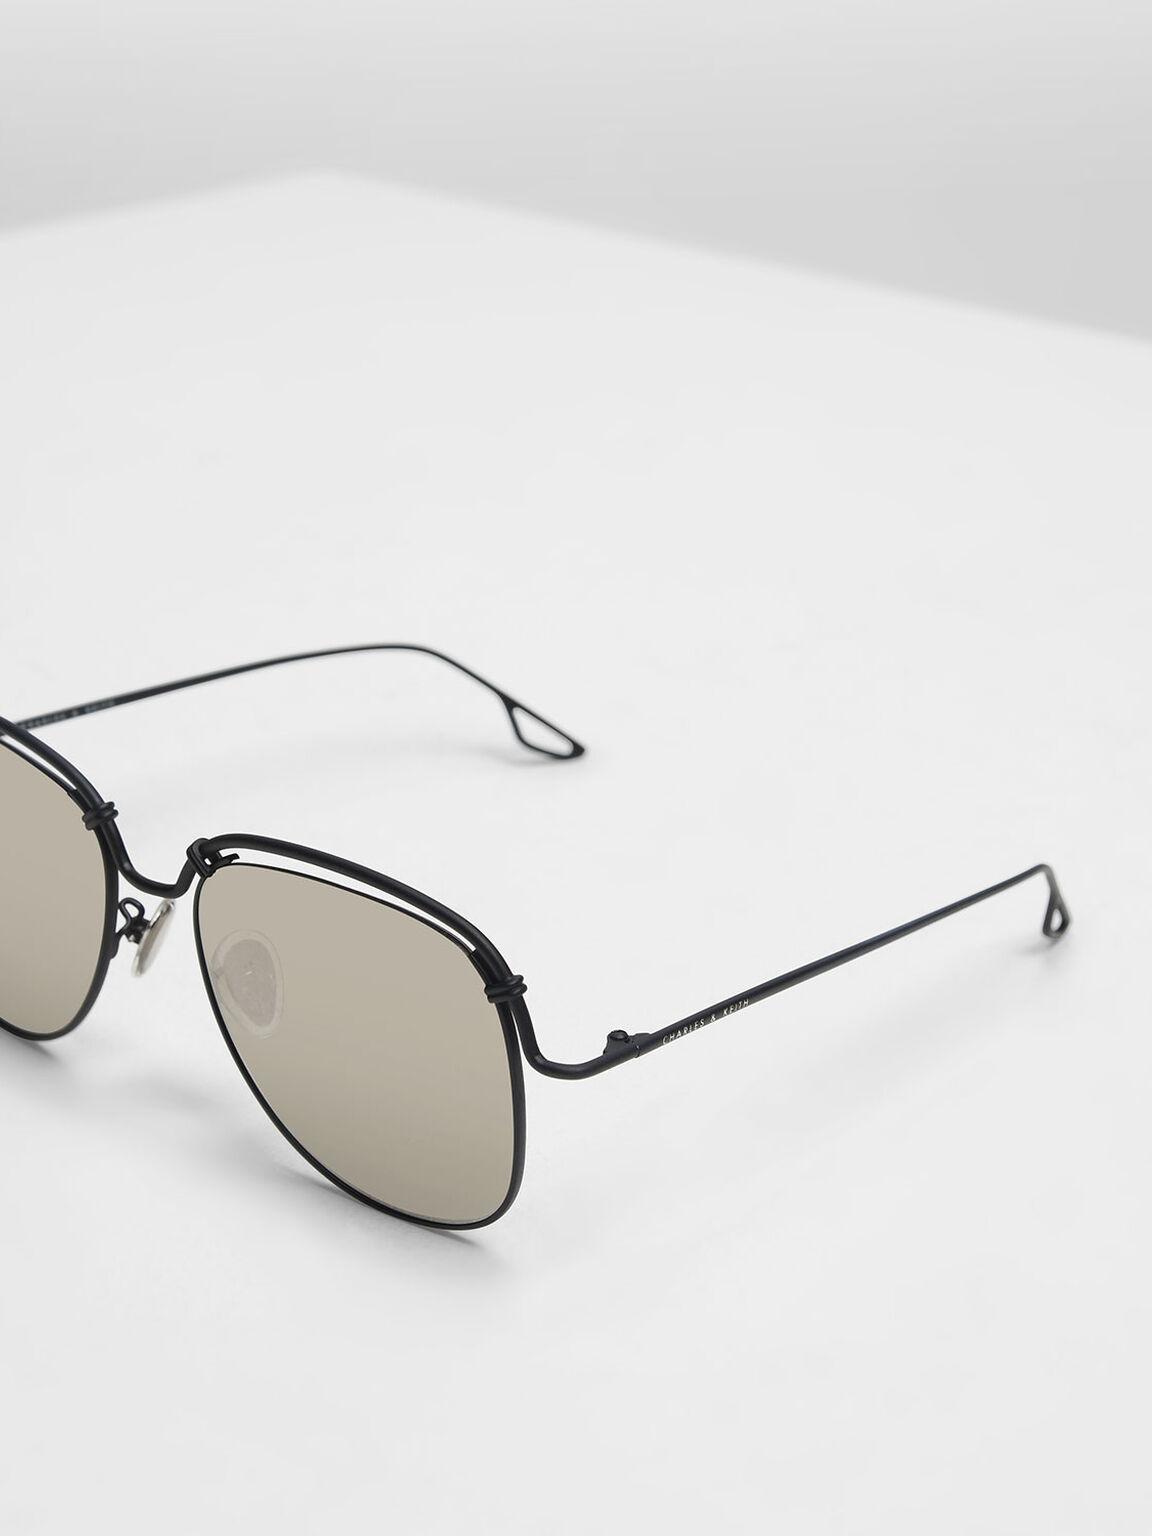 Half Wire Frame Sunglasses, Black, hi-res